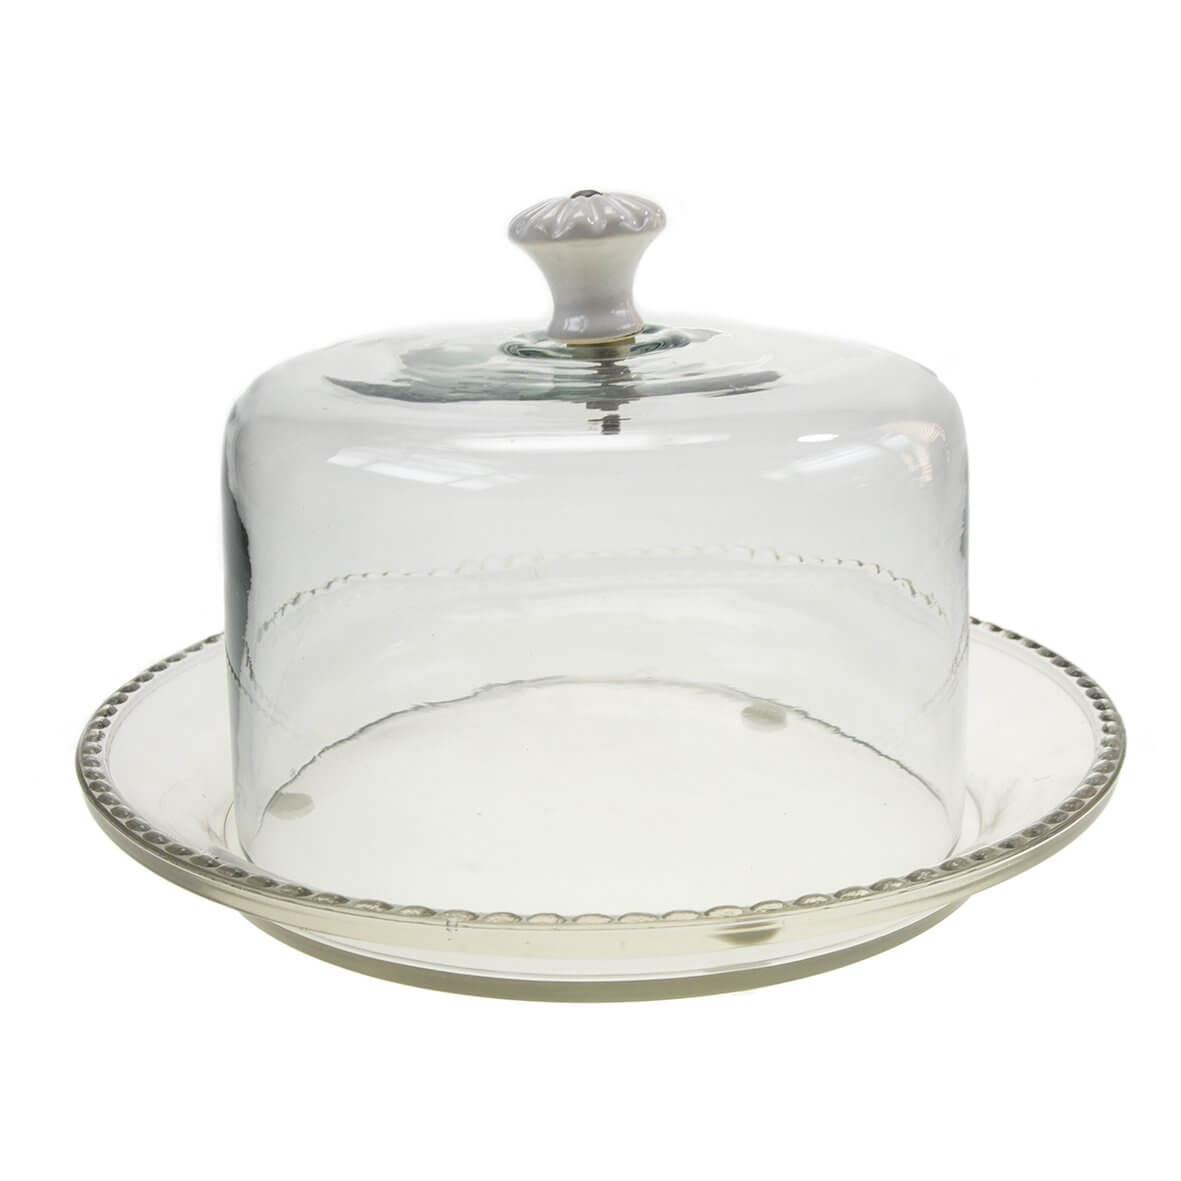 Glass Dome Cake Plate